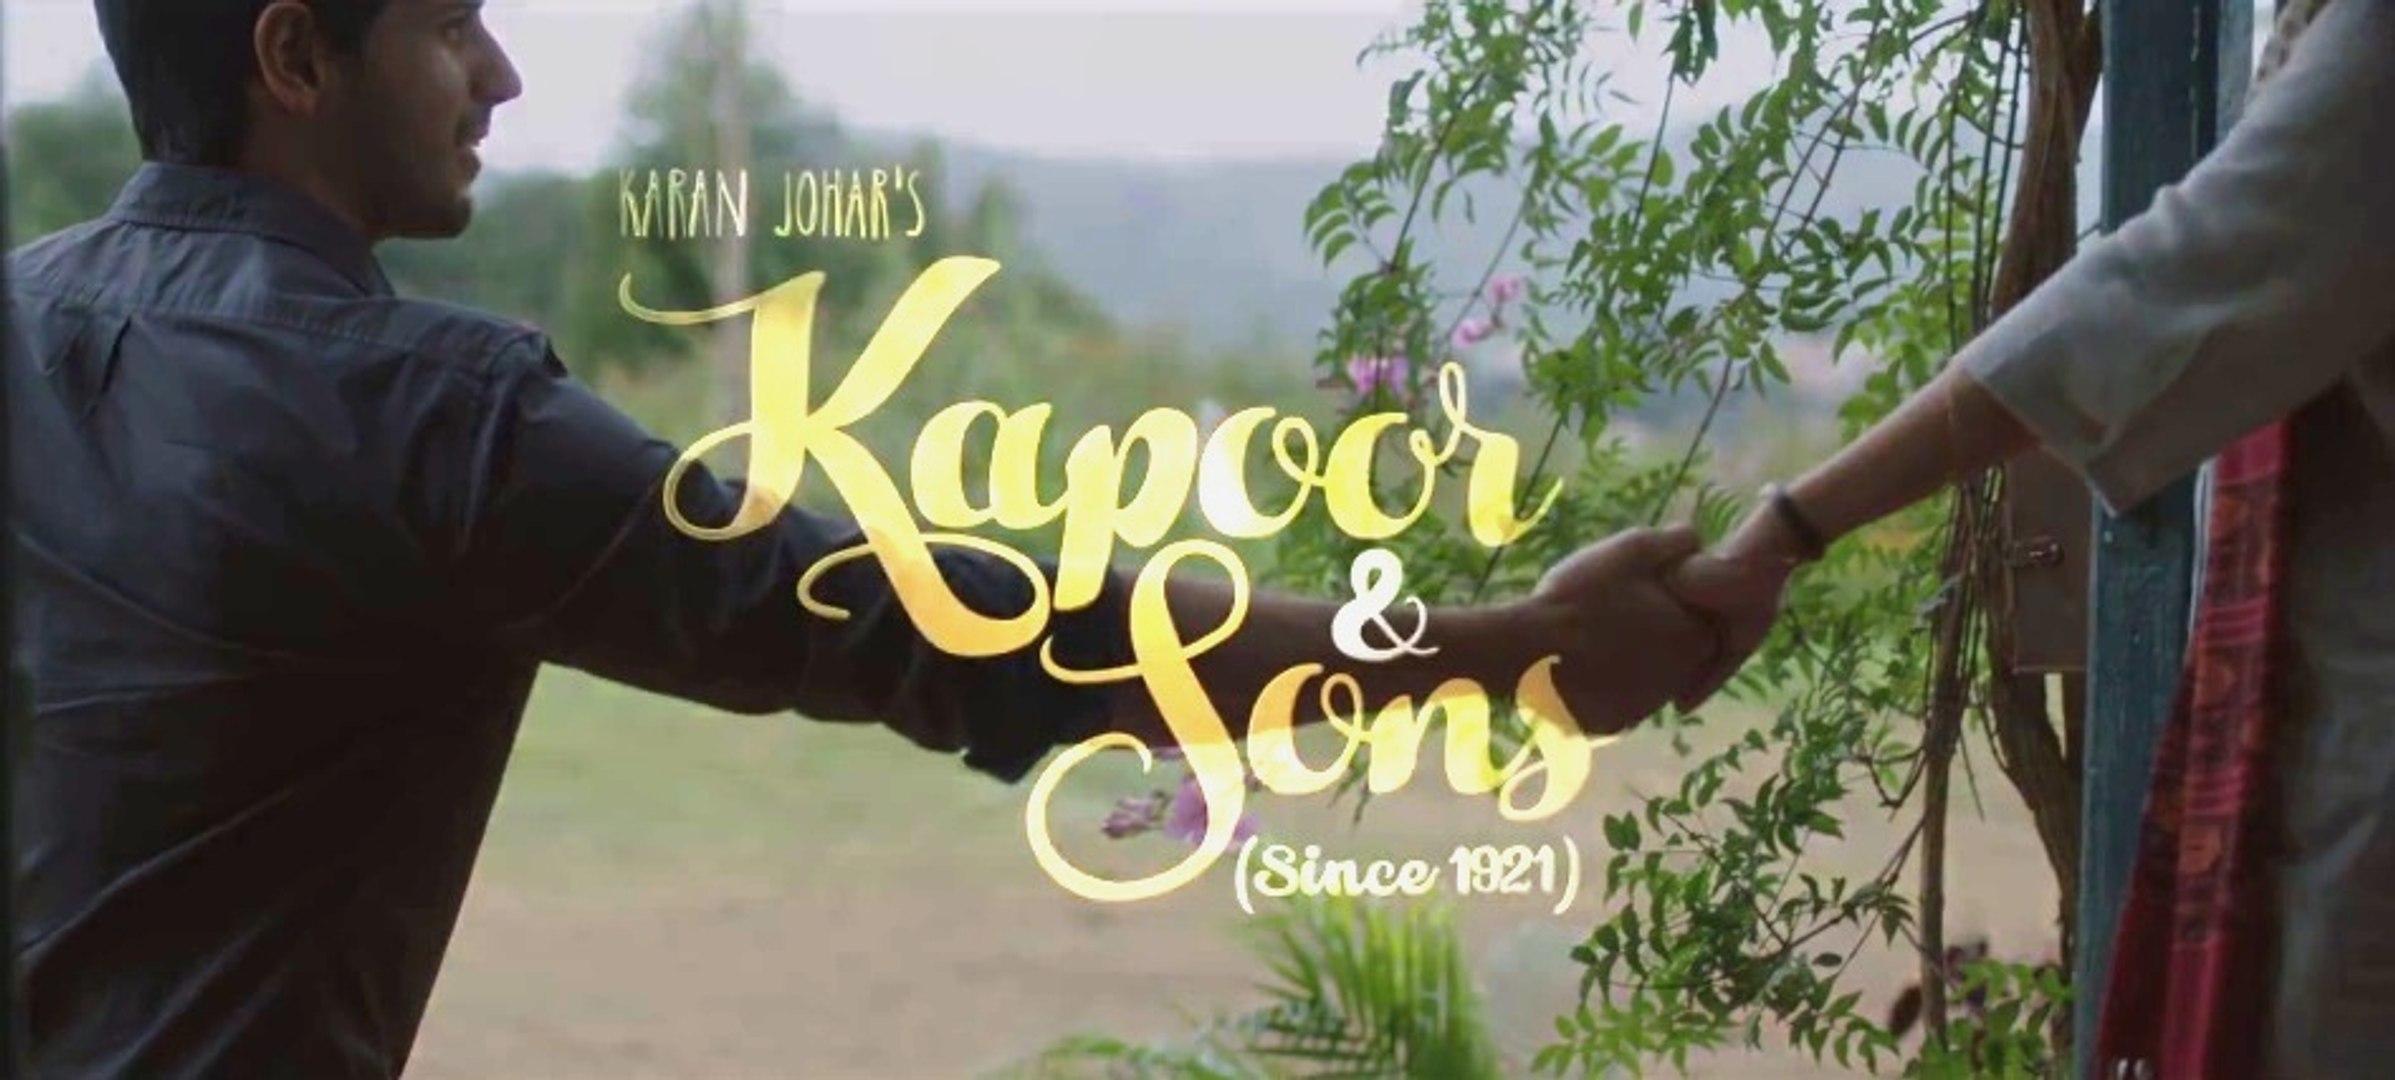 Kapoor & Sons Trailer - Bollywood Movie - Sidharth Malhotra Alia Bhatt Fawad Khan - Kapoor &